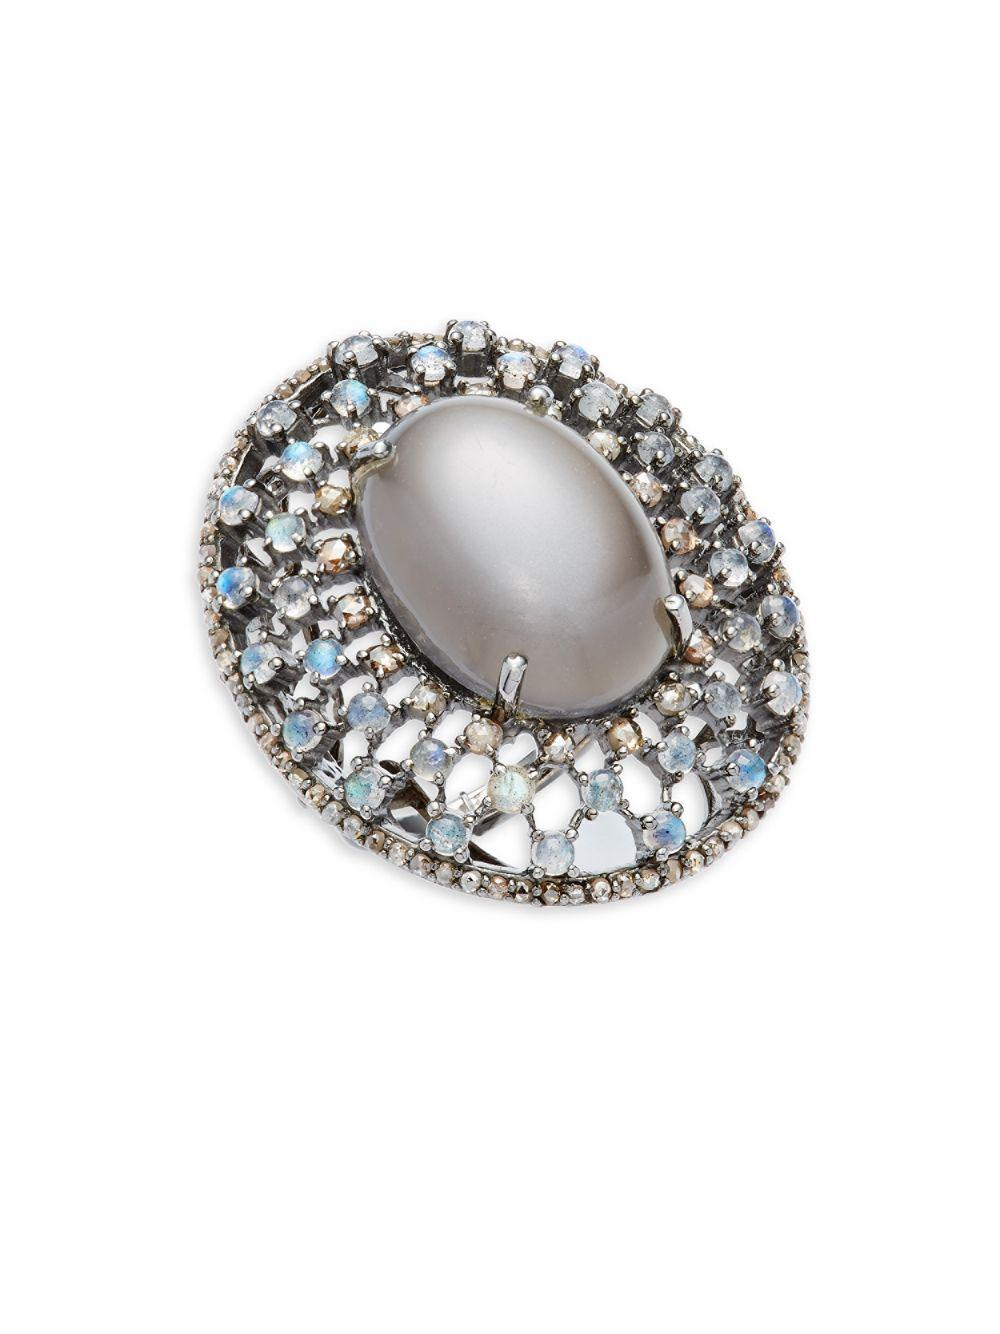 Bavna Moonstone & Diamond Kite Ring, Size 7